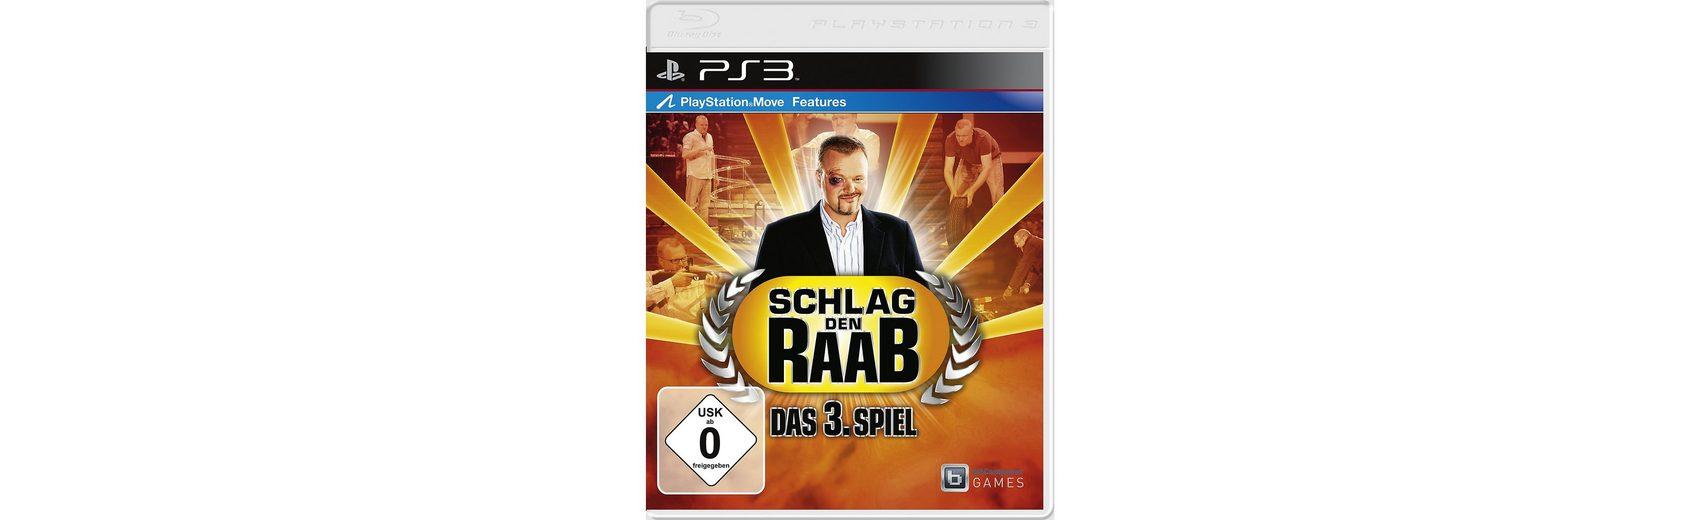 ak tronic PS3 Schlag den Raab 3